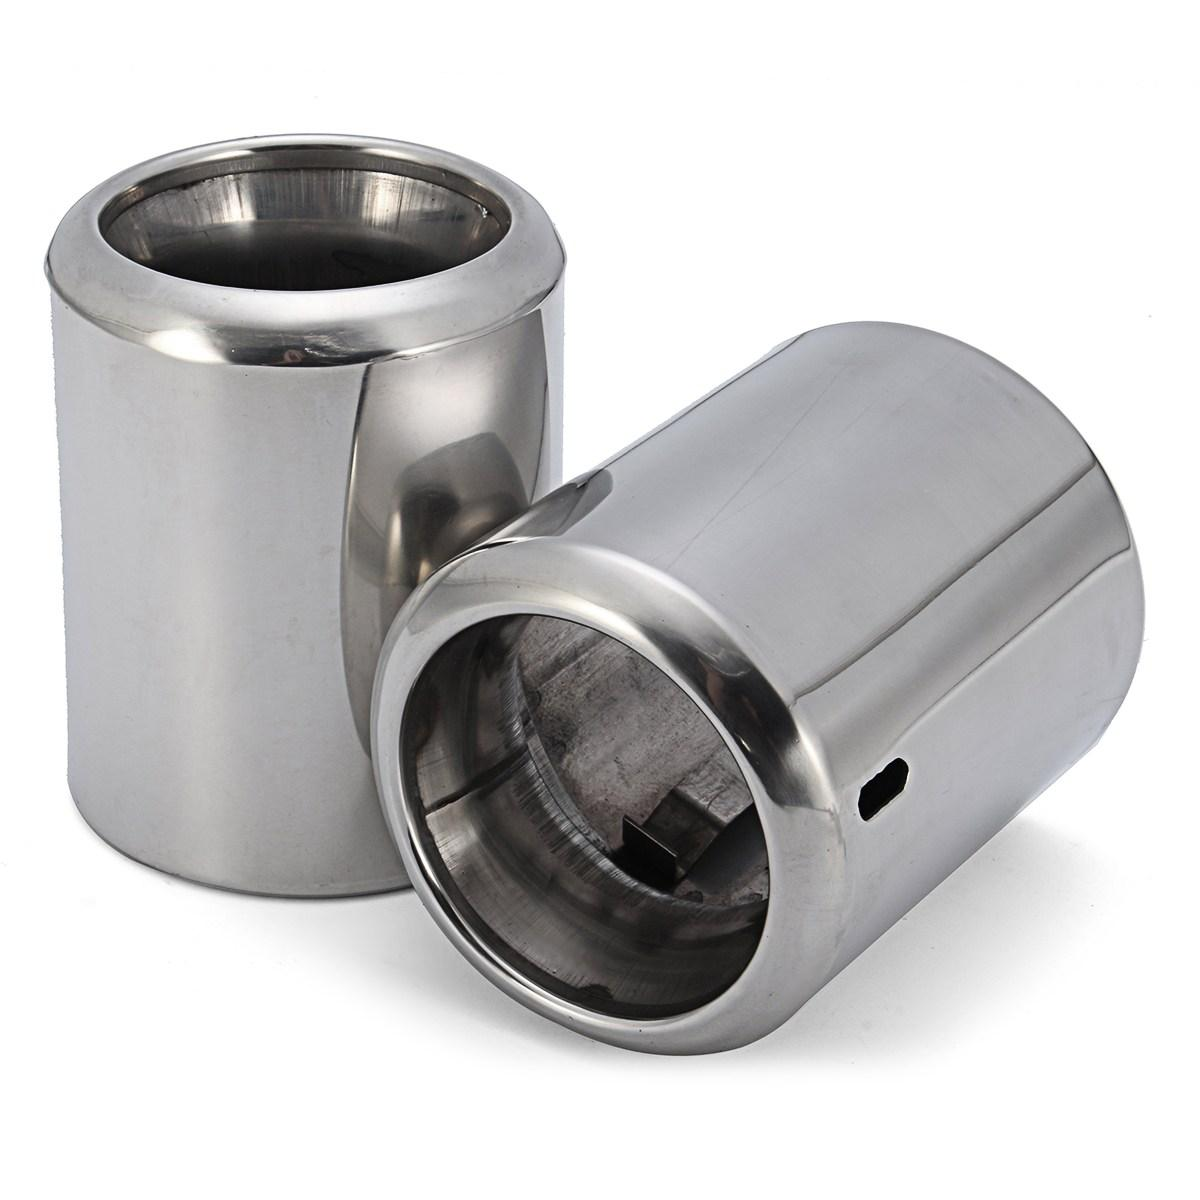 S.Steel EXHAUST MUFFLER CHROME TRIM TIP PIPE For Mazda 6 2014 2015 2016